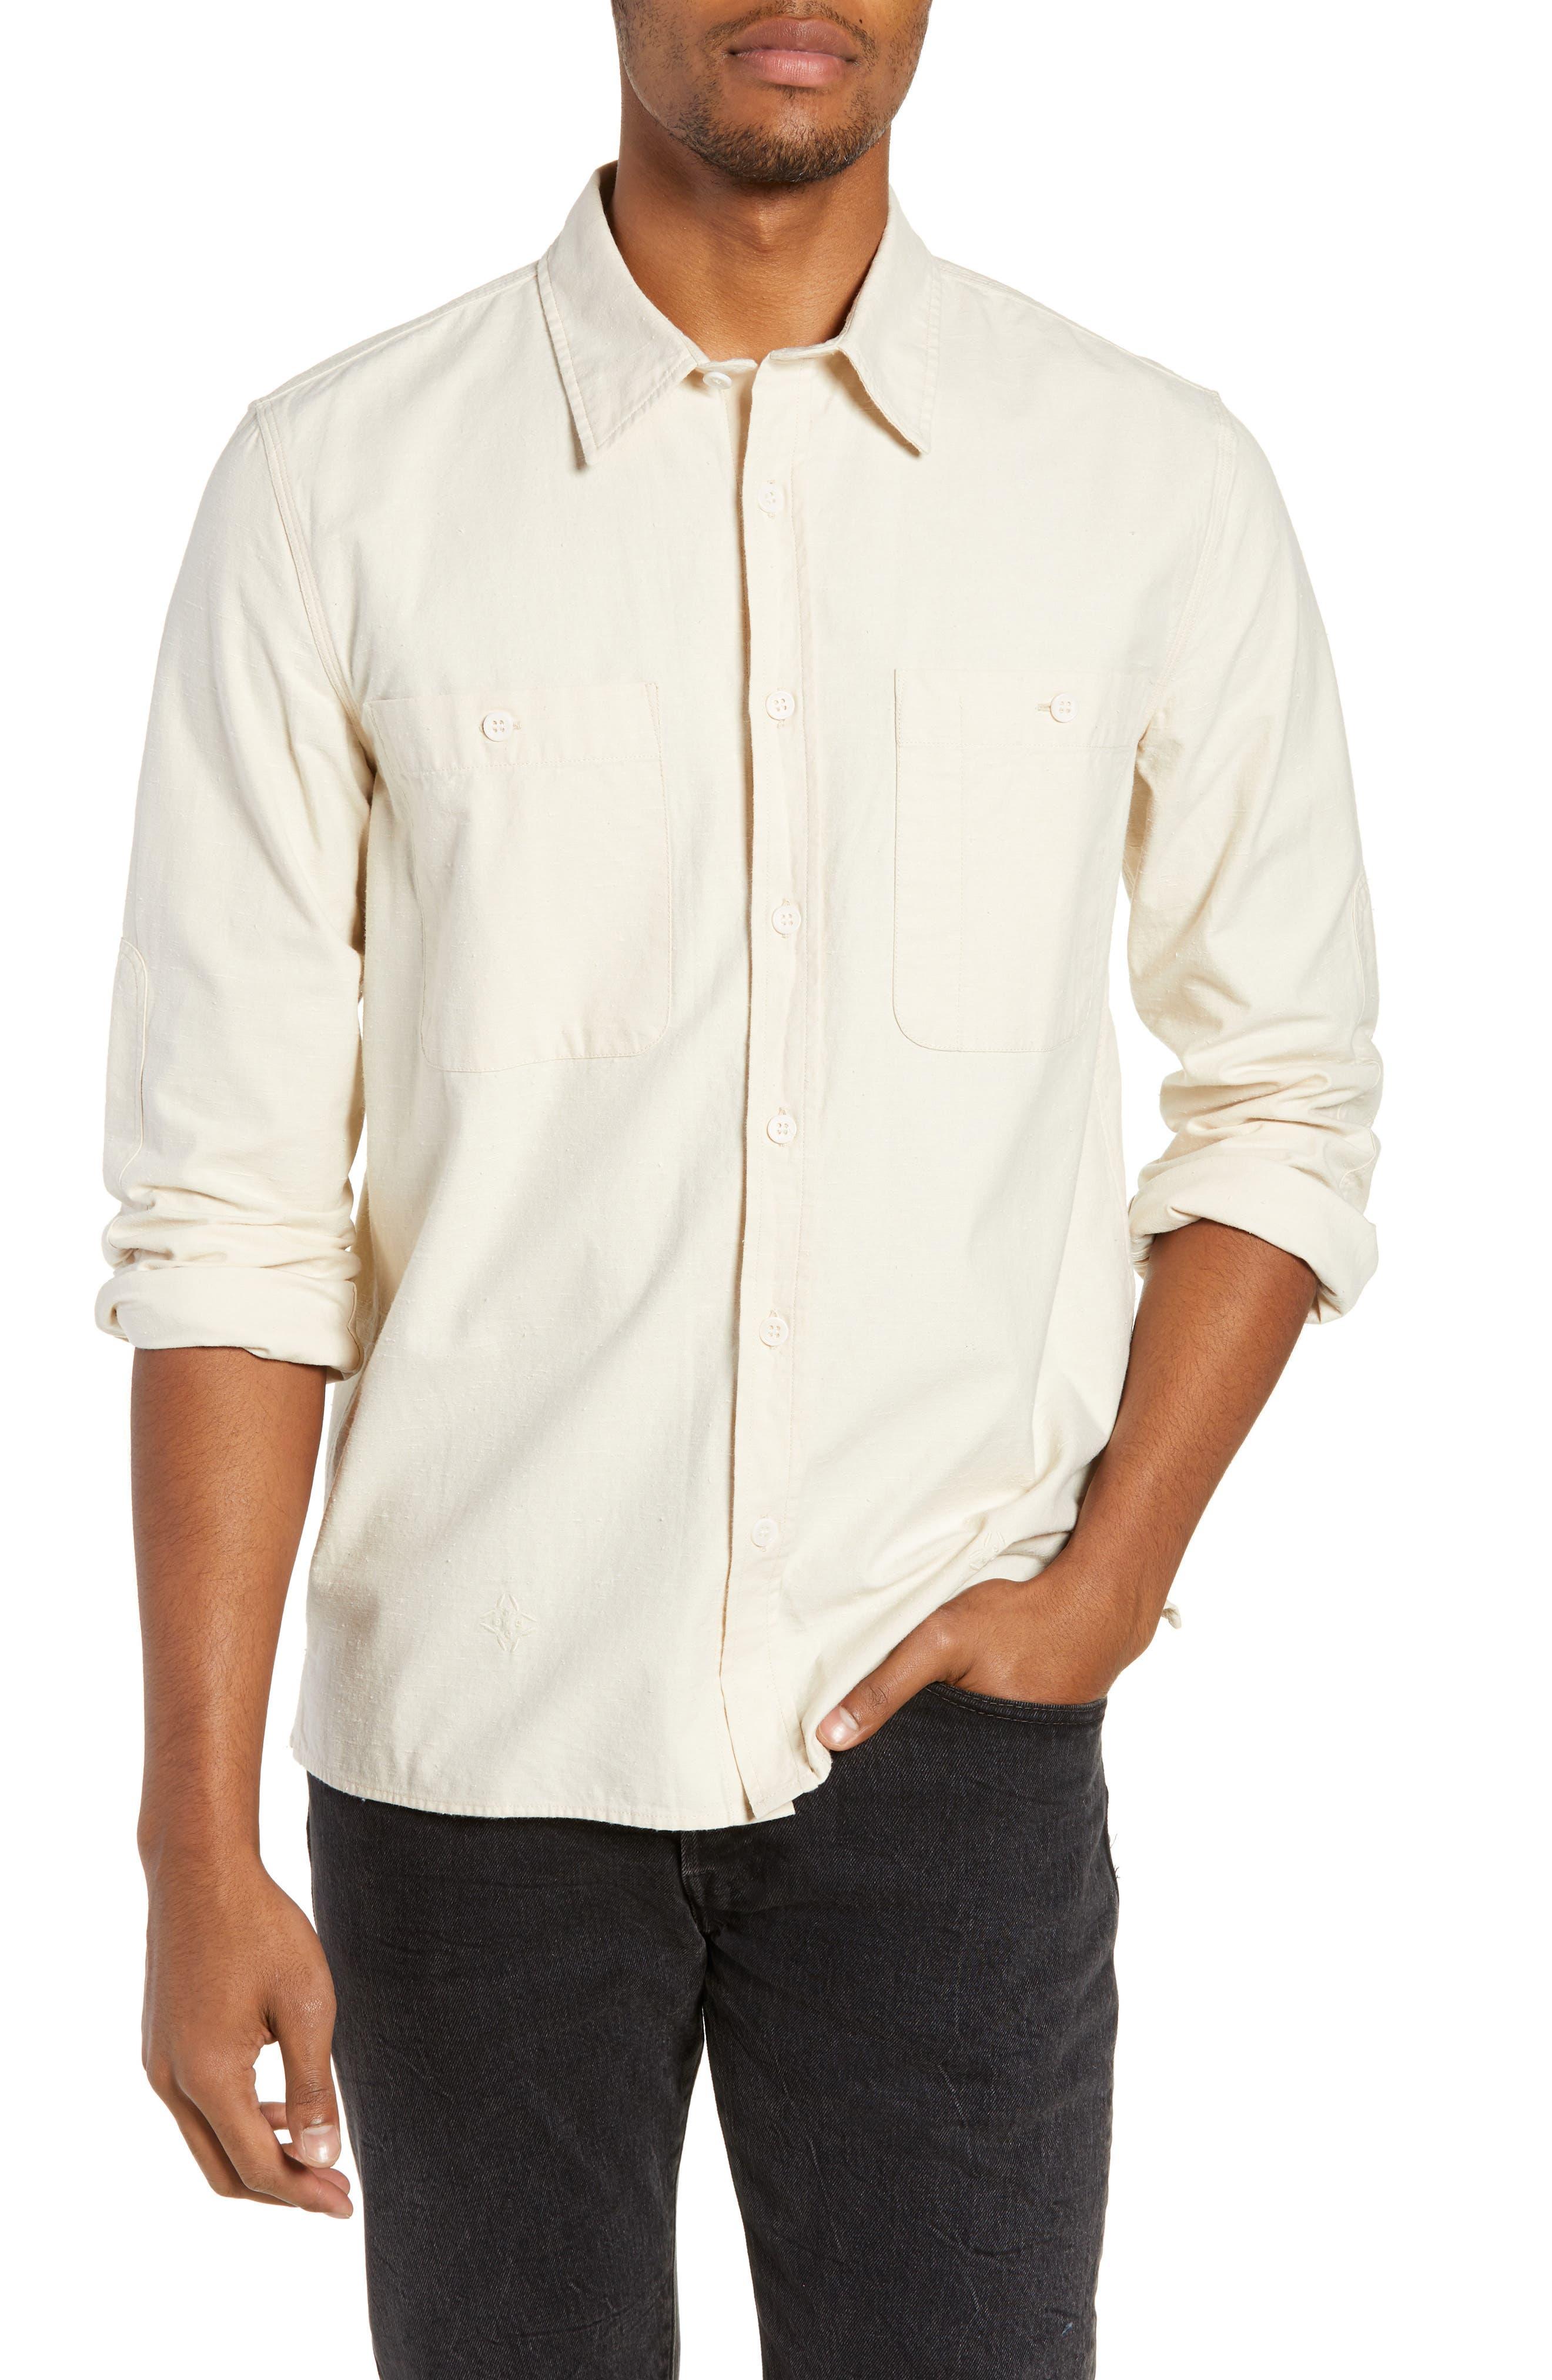 Workwear Regular Fit Shirt,                             Main thumbnail 1, color,                             PRISTINE